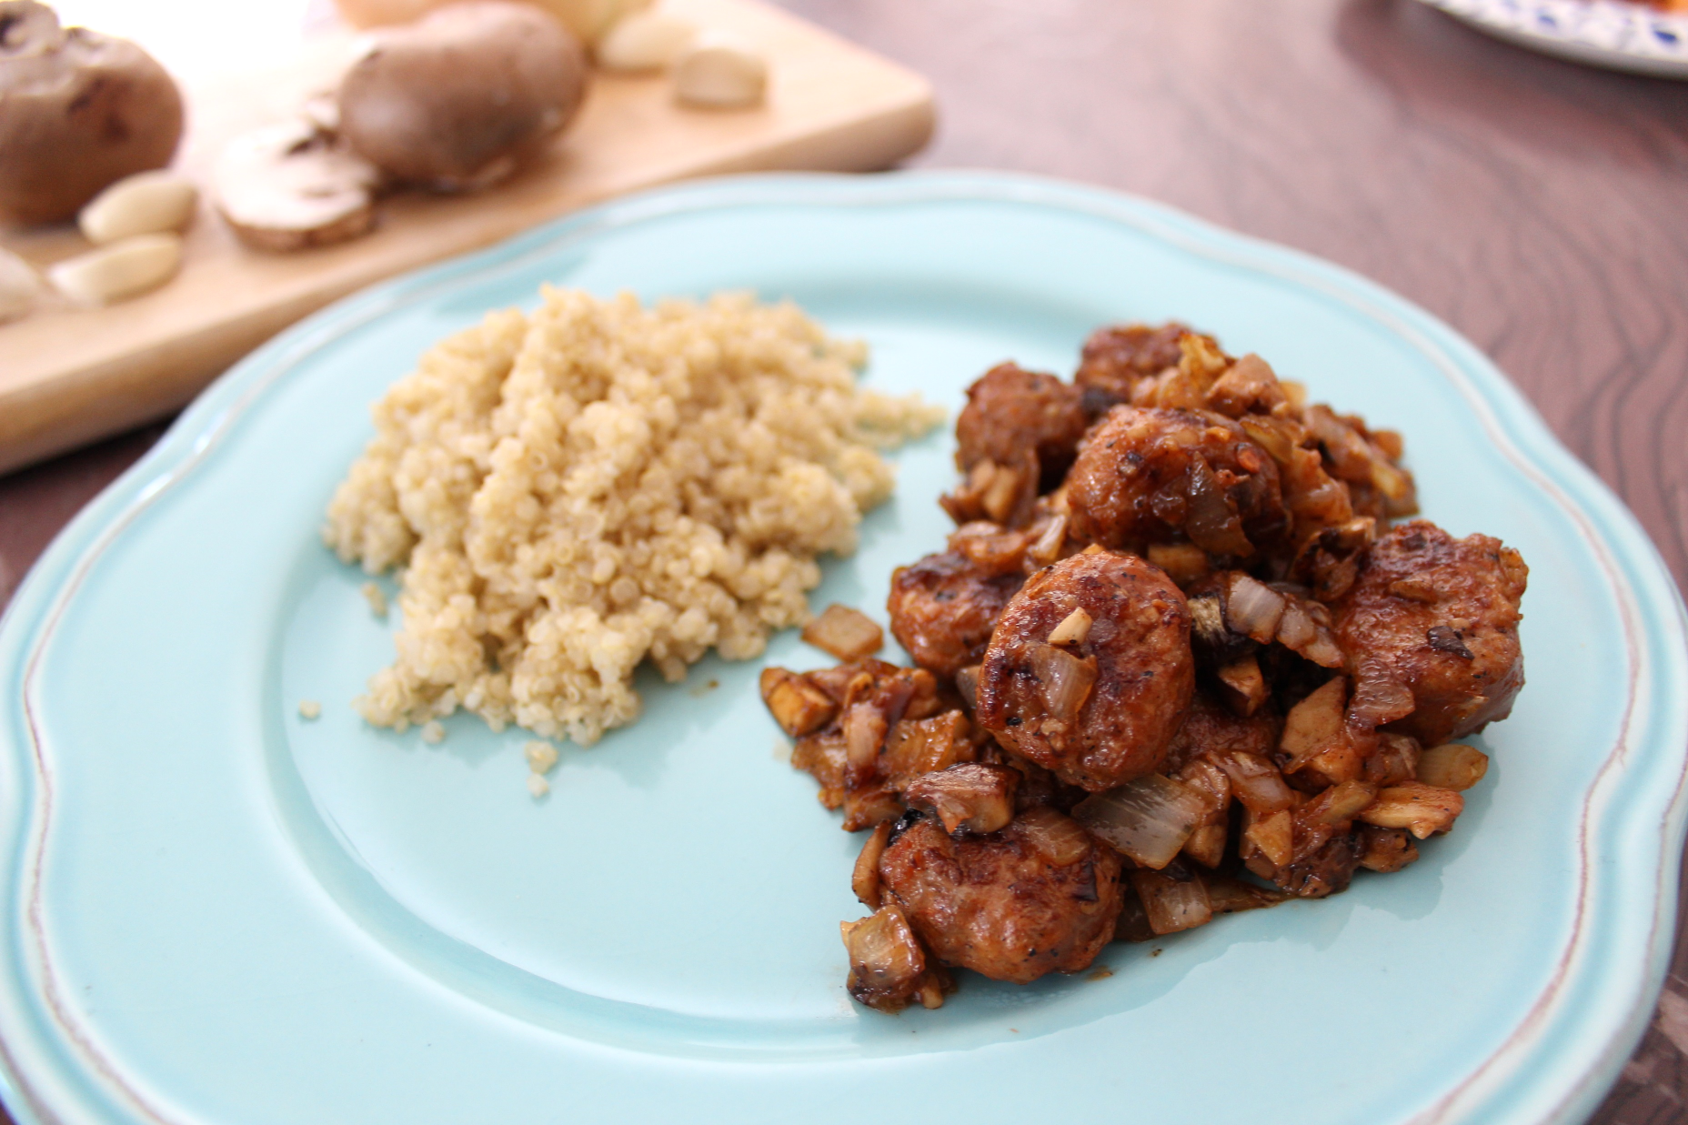 Sauteed Spicy Sausage & Mushrooms